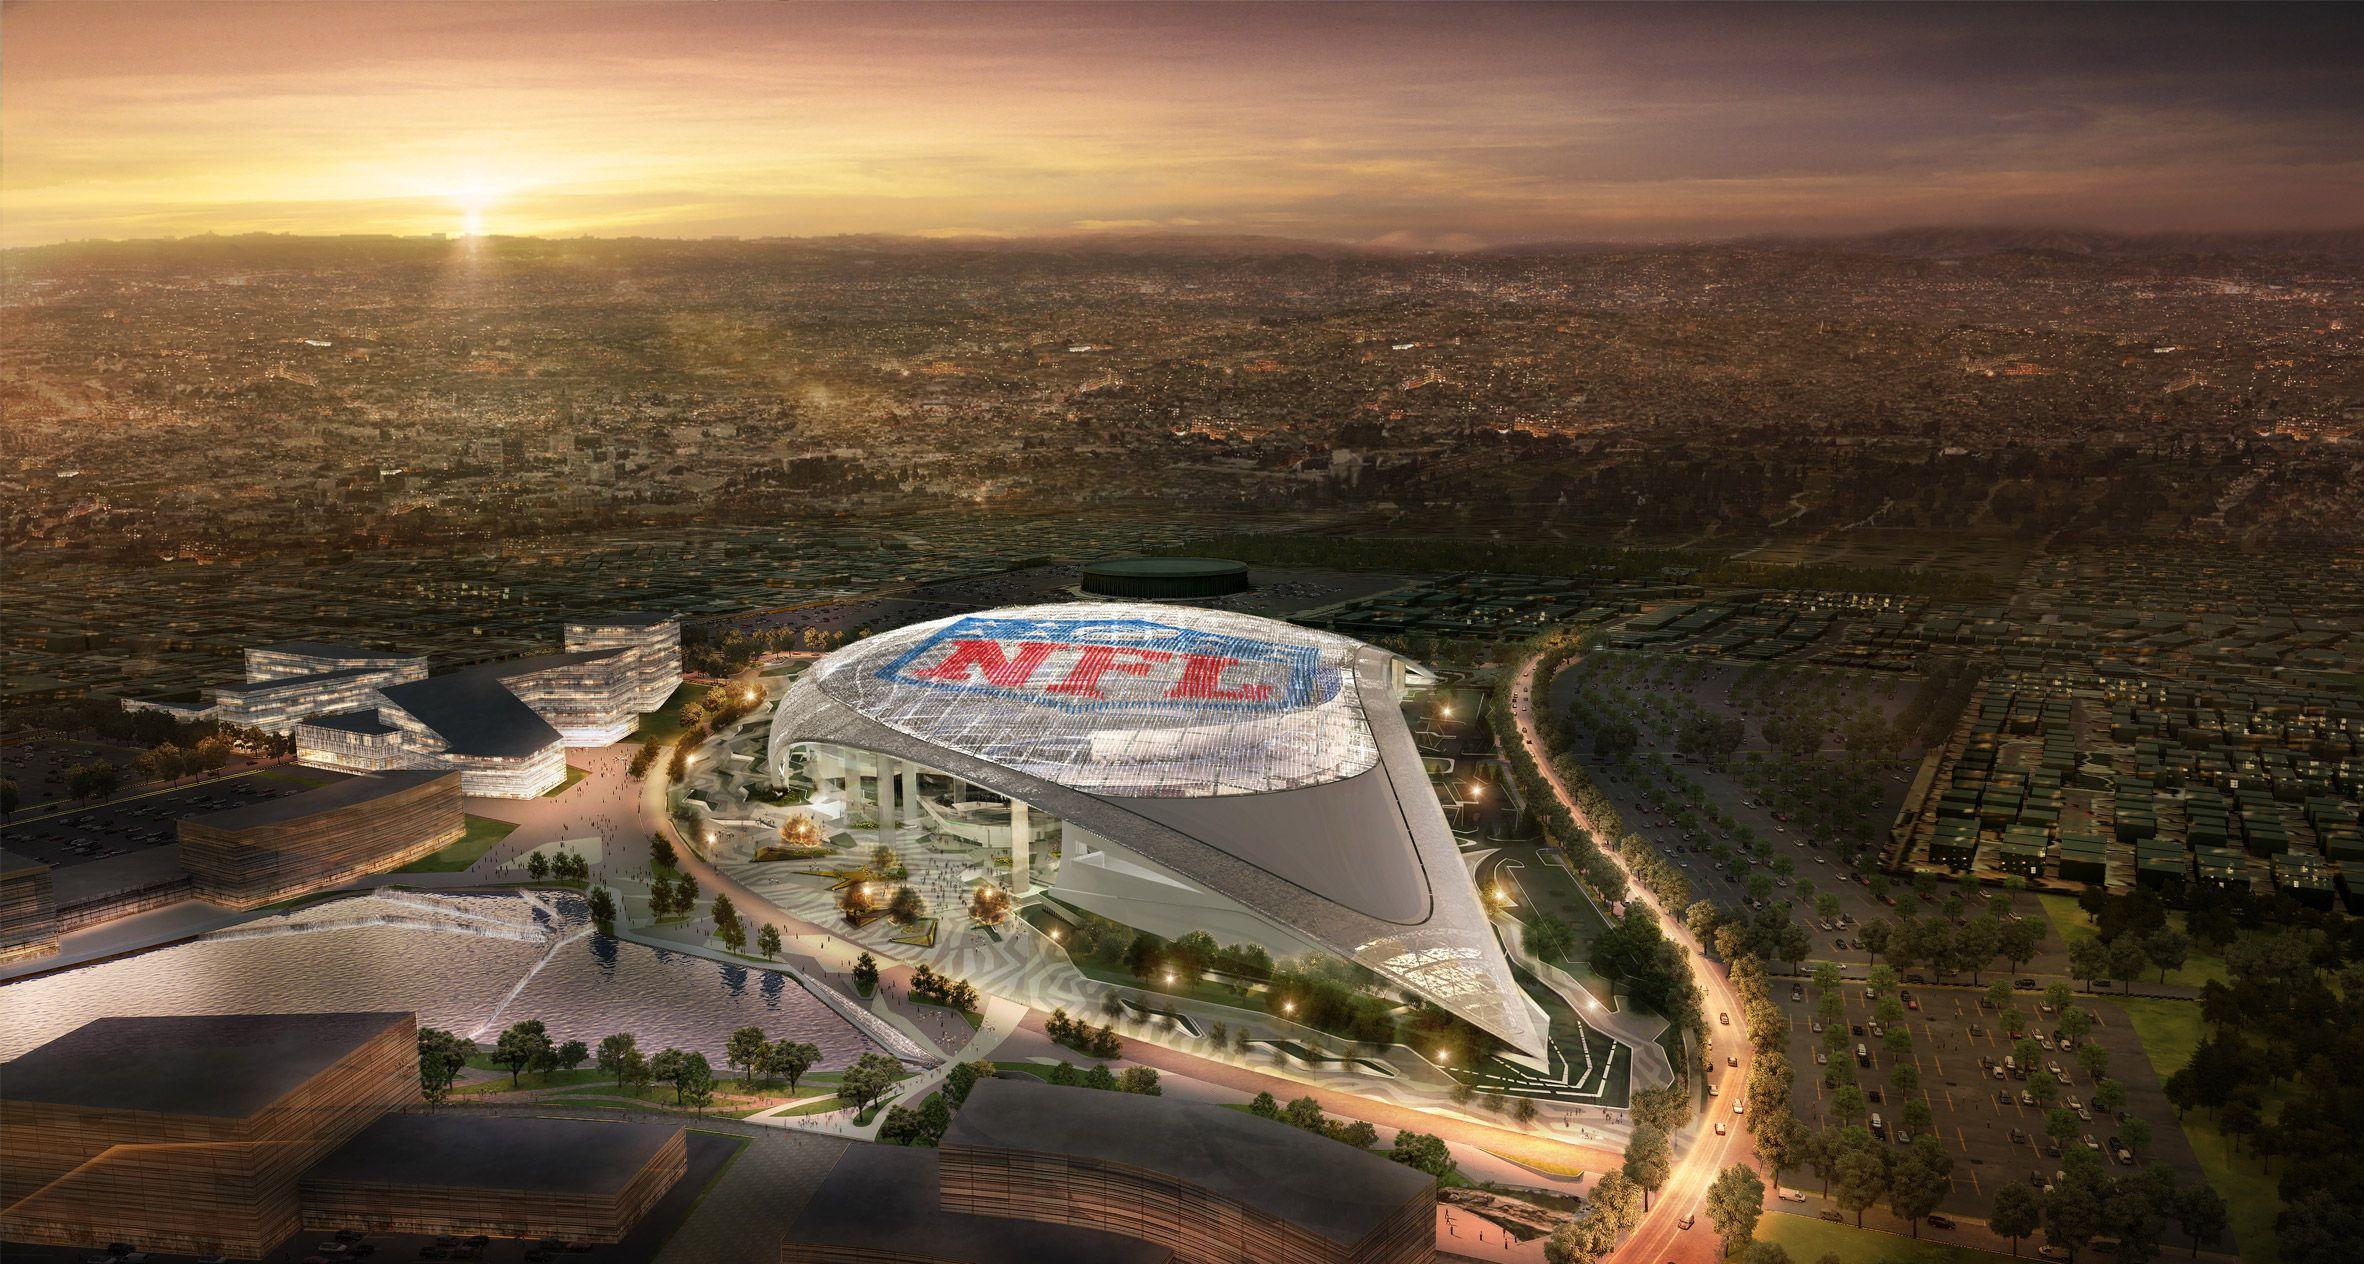 La Rams Stadium Hks Los Angeles Usa Architecture Dezeen 2364 Col 4 Nfl Stadiums New Football Stadiums Los Angeles Rams